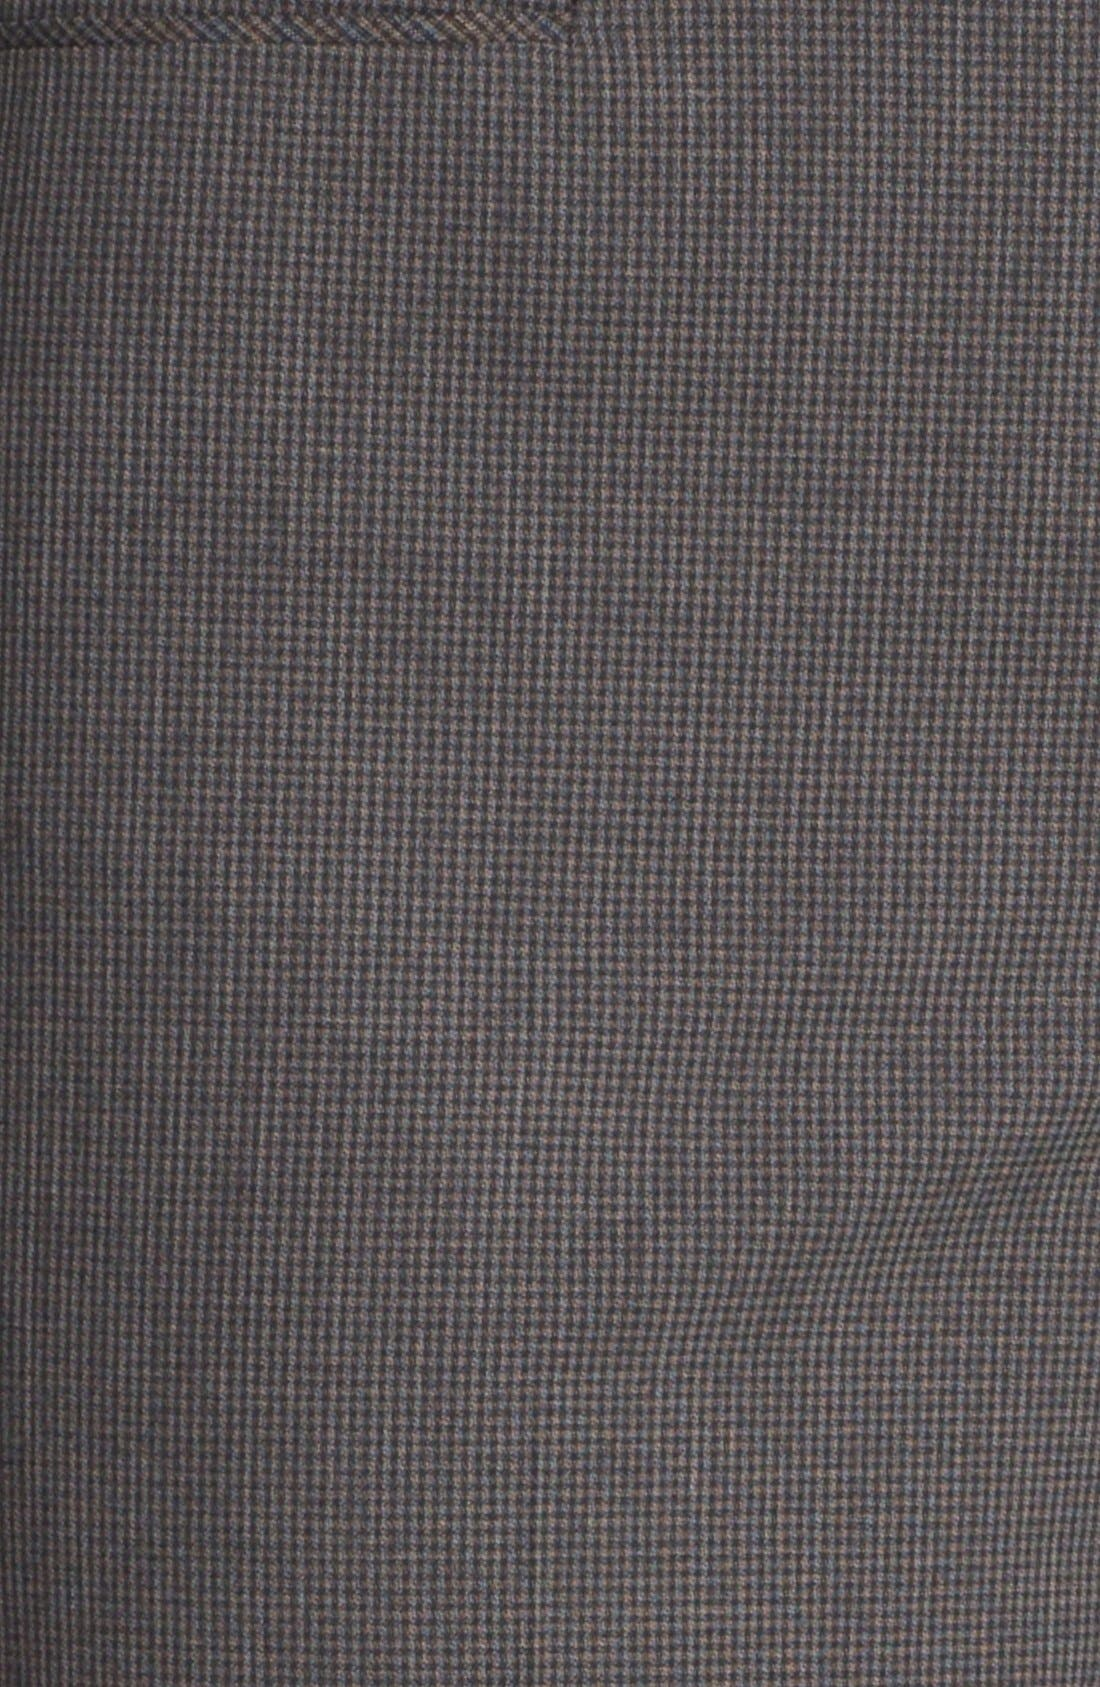 Alternate Image 3  - Halogen® 'Taylor' Mini Check Curvy Fit Pants (Petite)